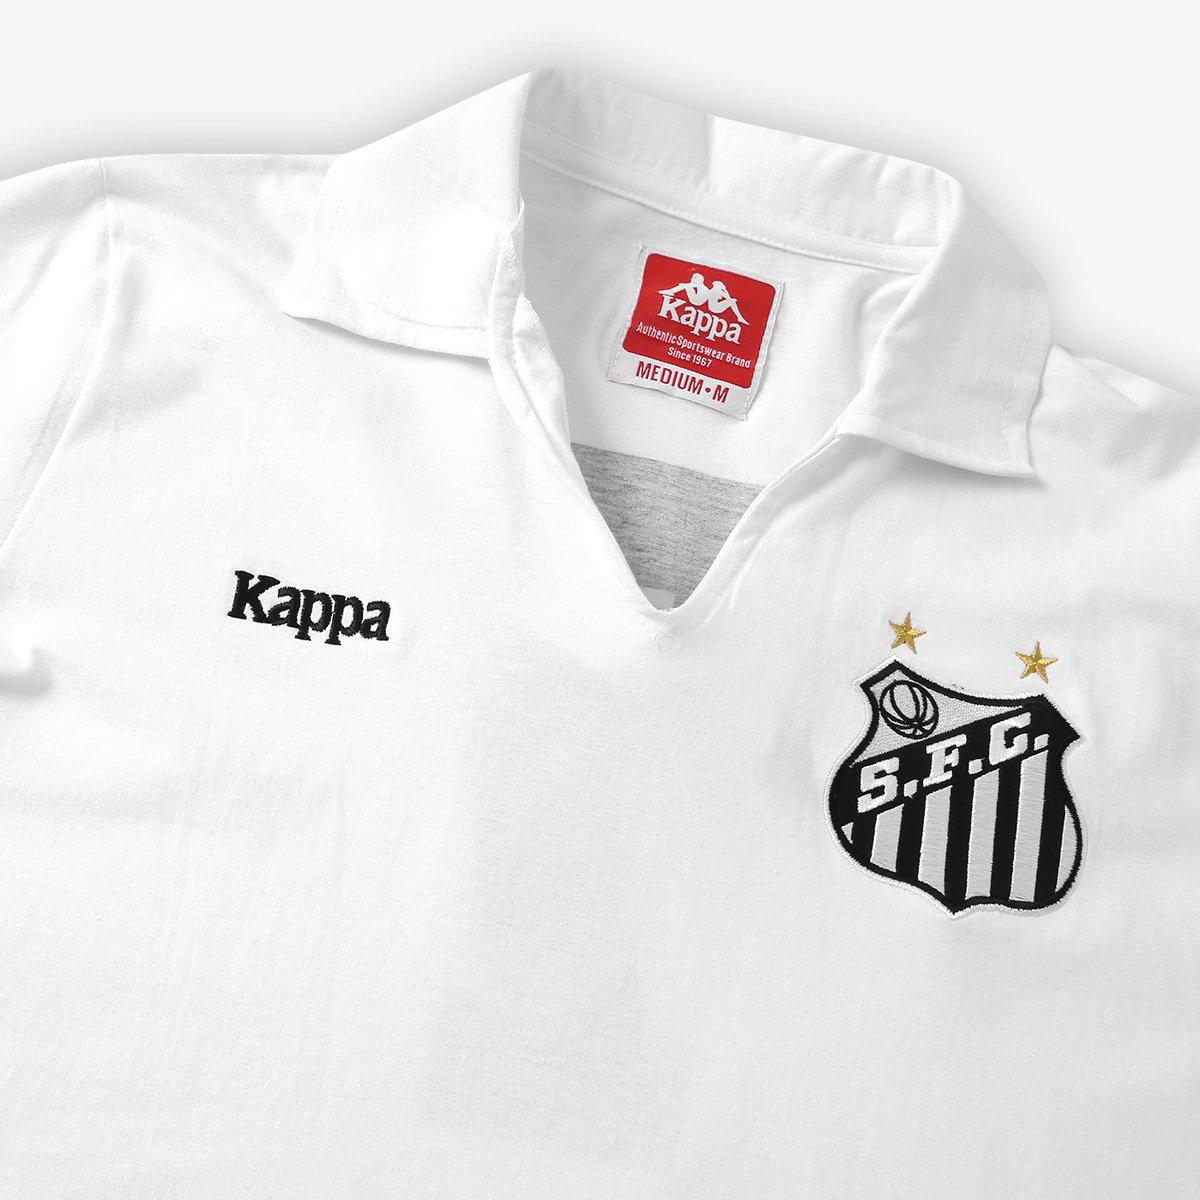 Camisa Polo Santos Authentic Réplica Masculina - Branco - Compre ... 6f5fcc6d4c5f3